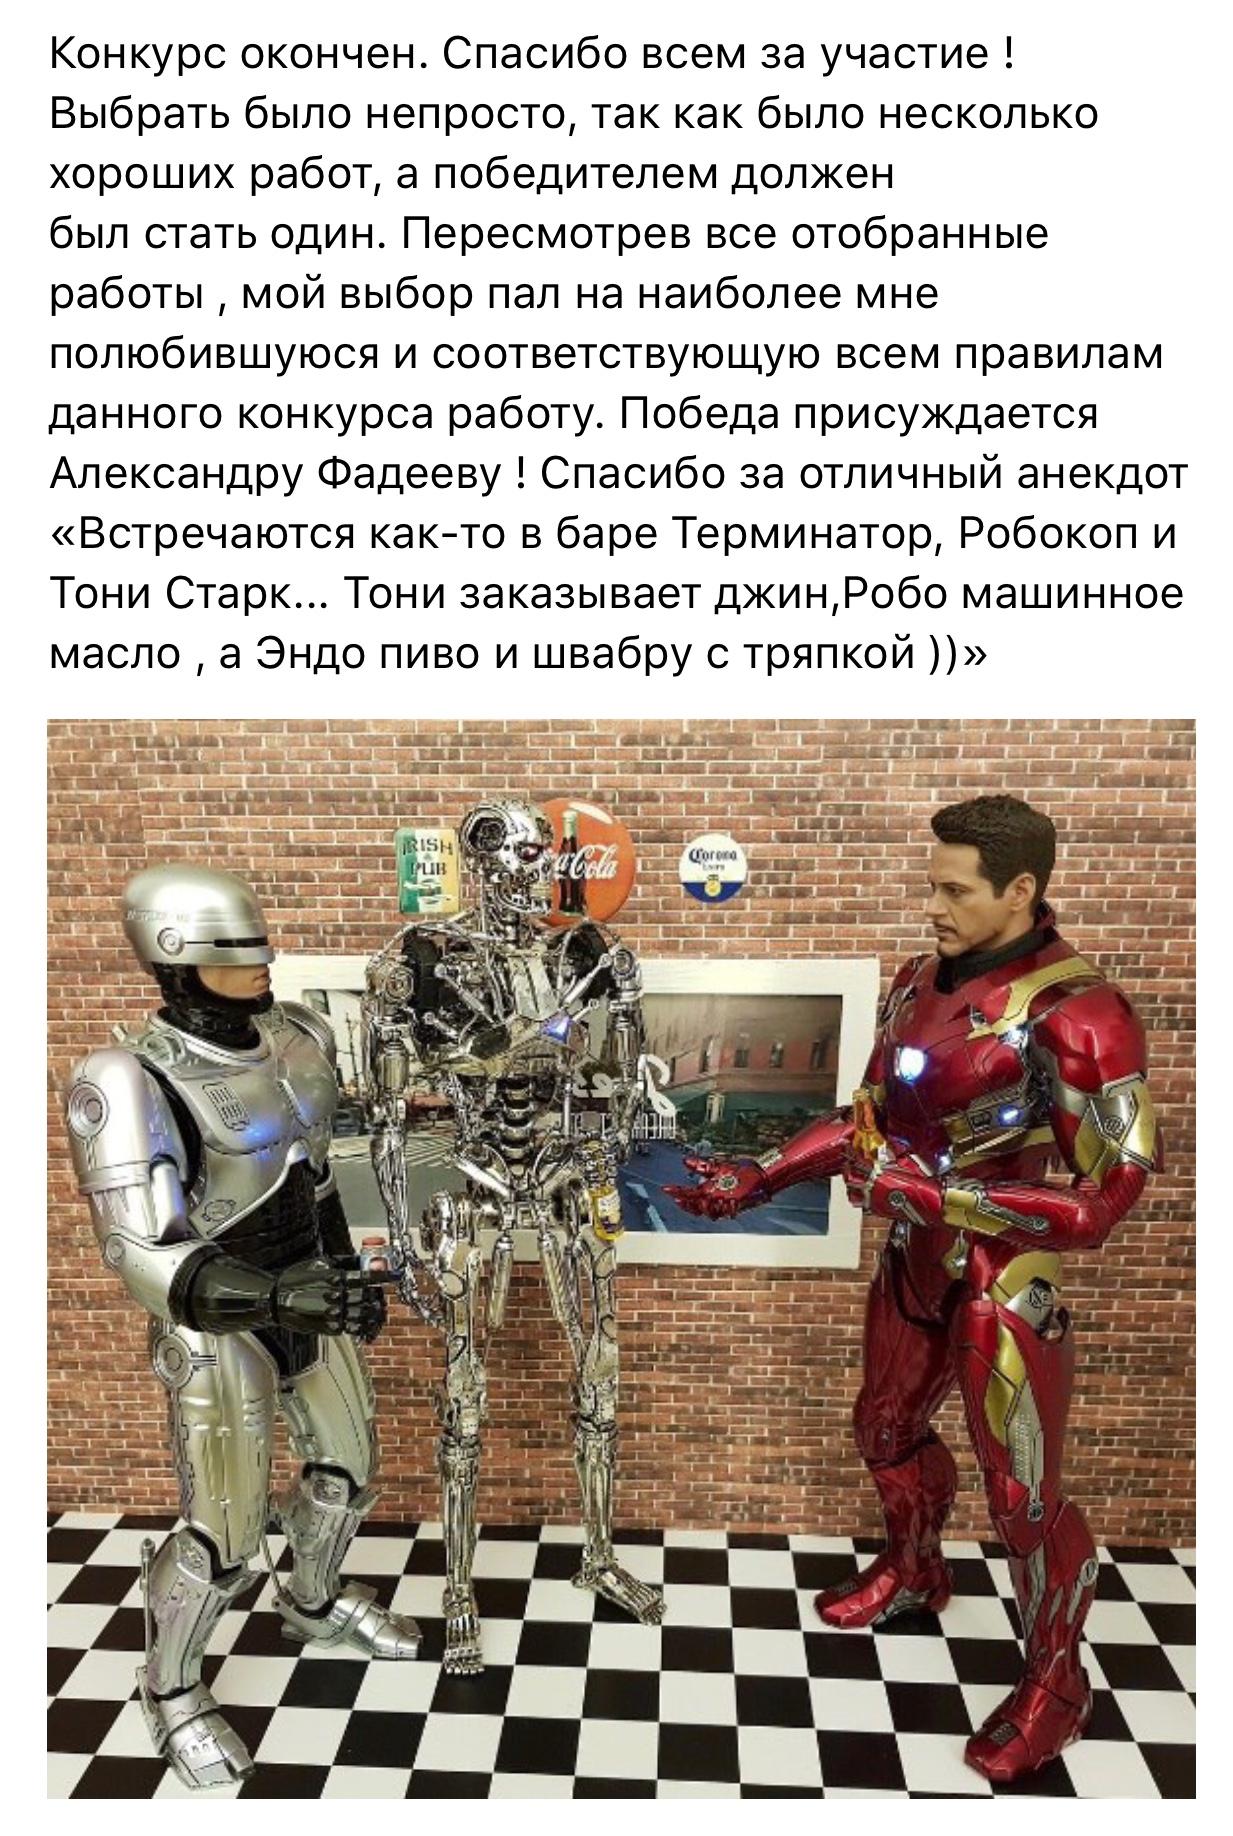 http://s8.uploads.ru/QVERf.jpg